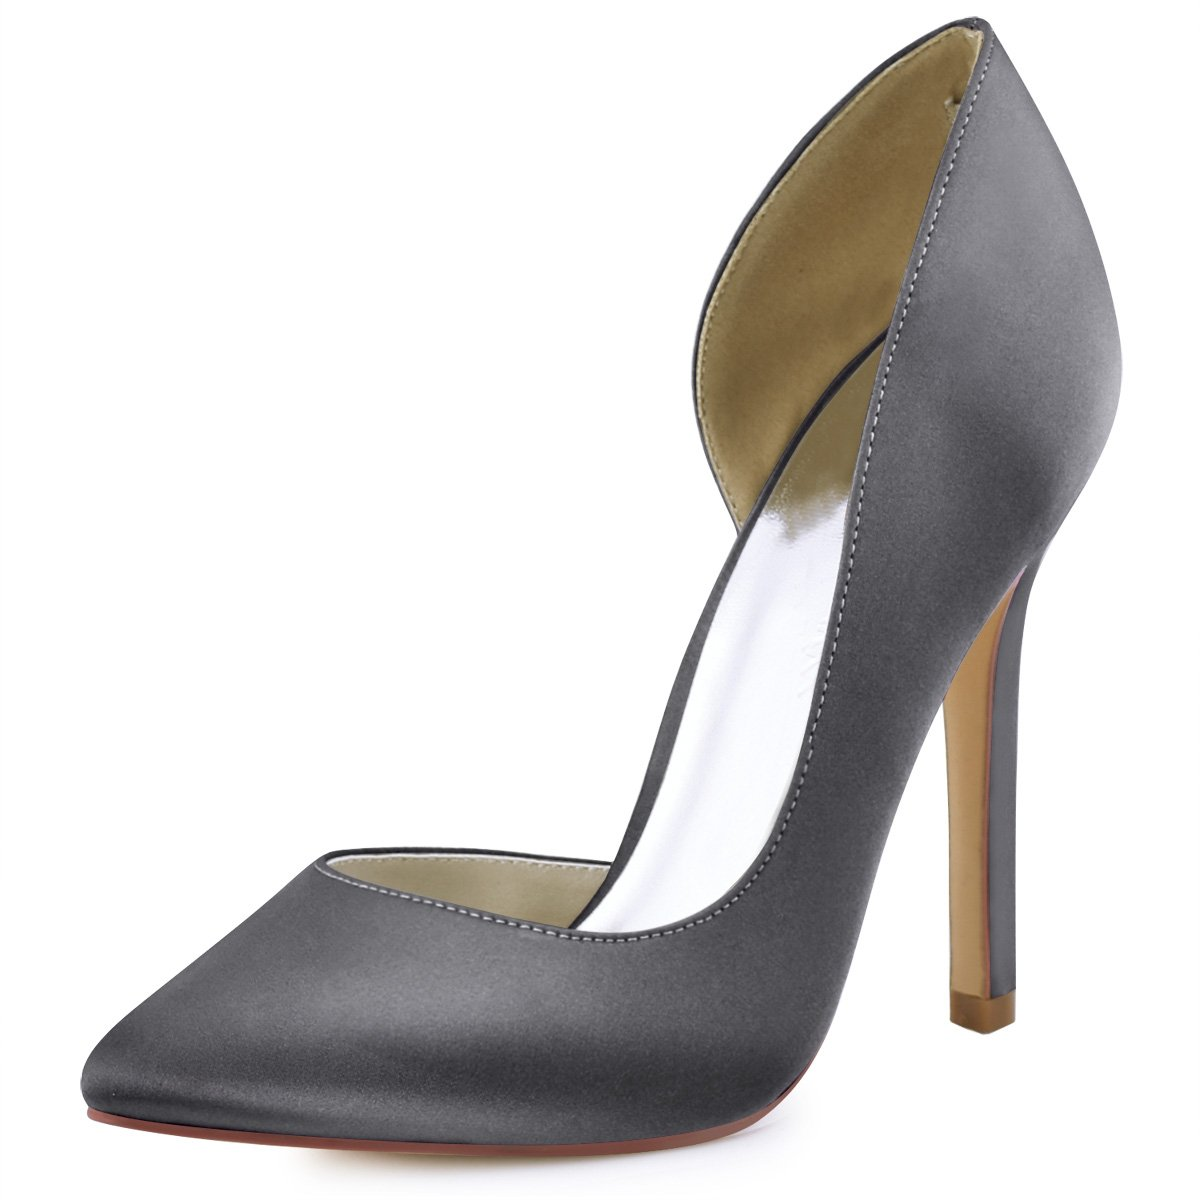 ElegantPark HC1601 Women's Pointed Toe High Heel D'Orsay Satin Dress Pumps Steel Grey US 8